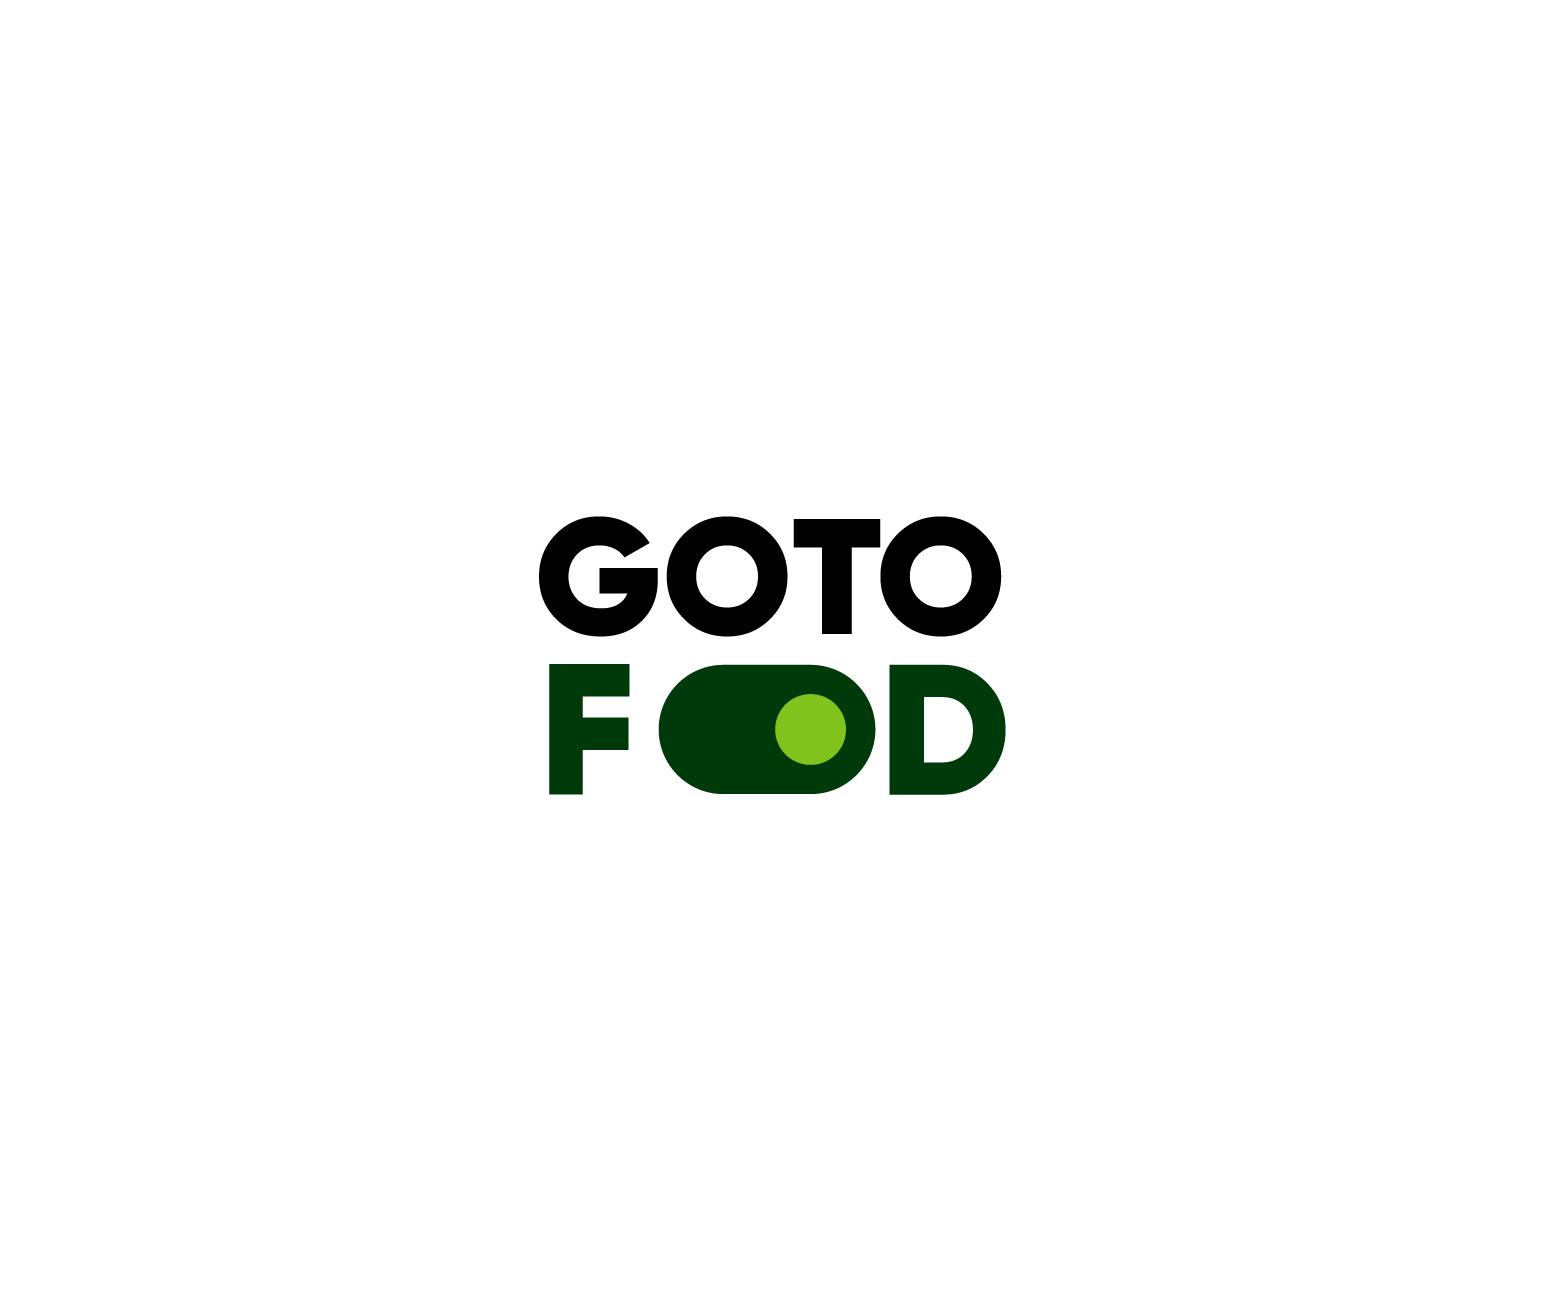 Логотип интернет-магазина здоровой еды фото f_1955cd4722e04860.jpg